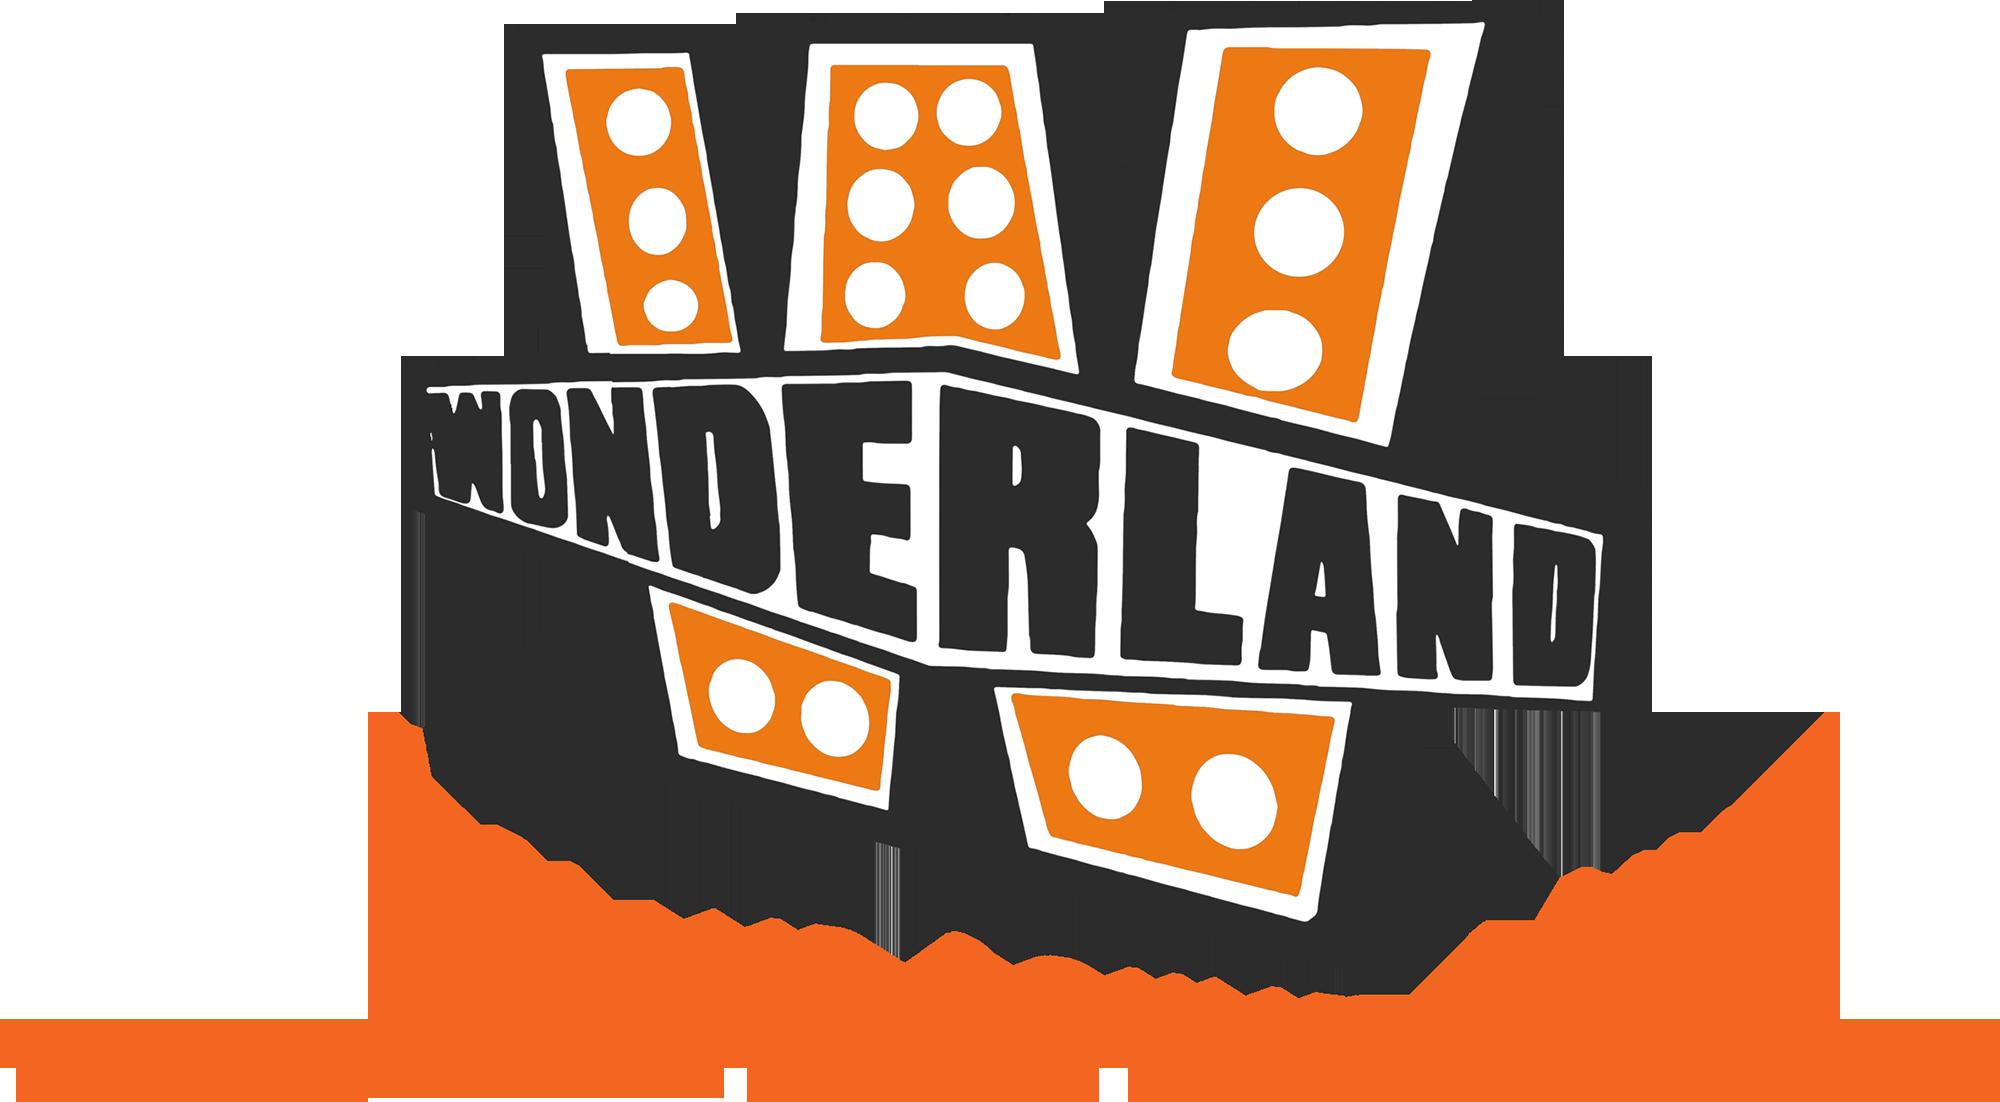 Wonderland Sound and Vision